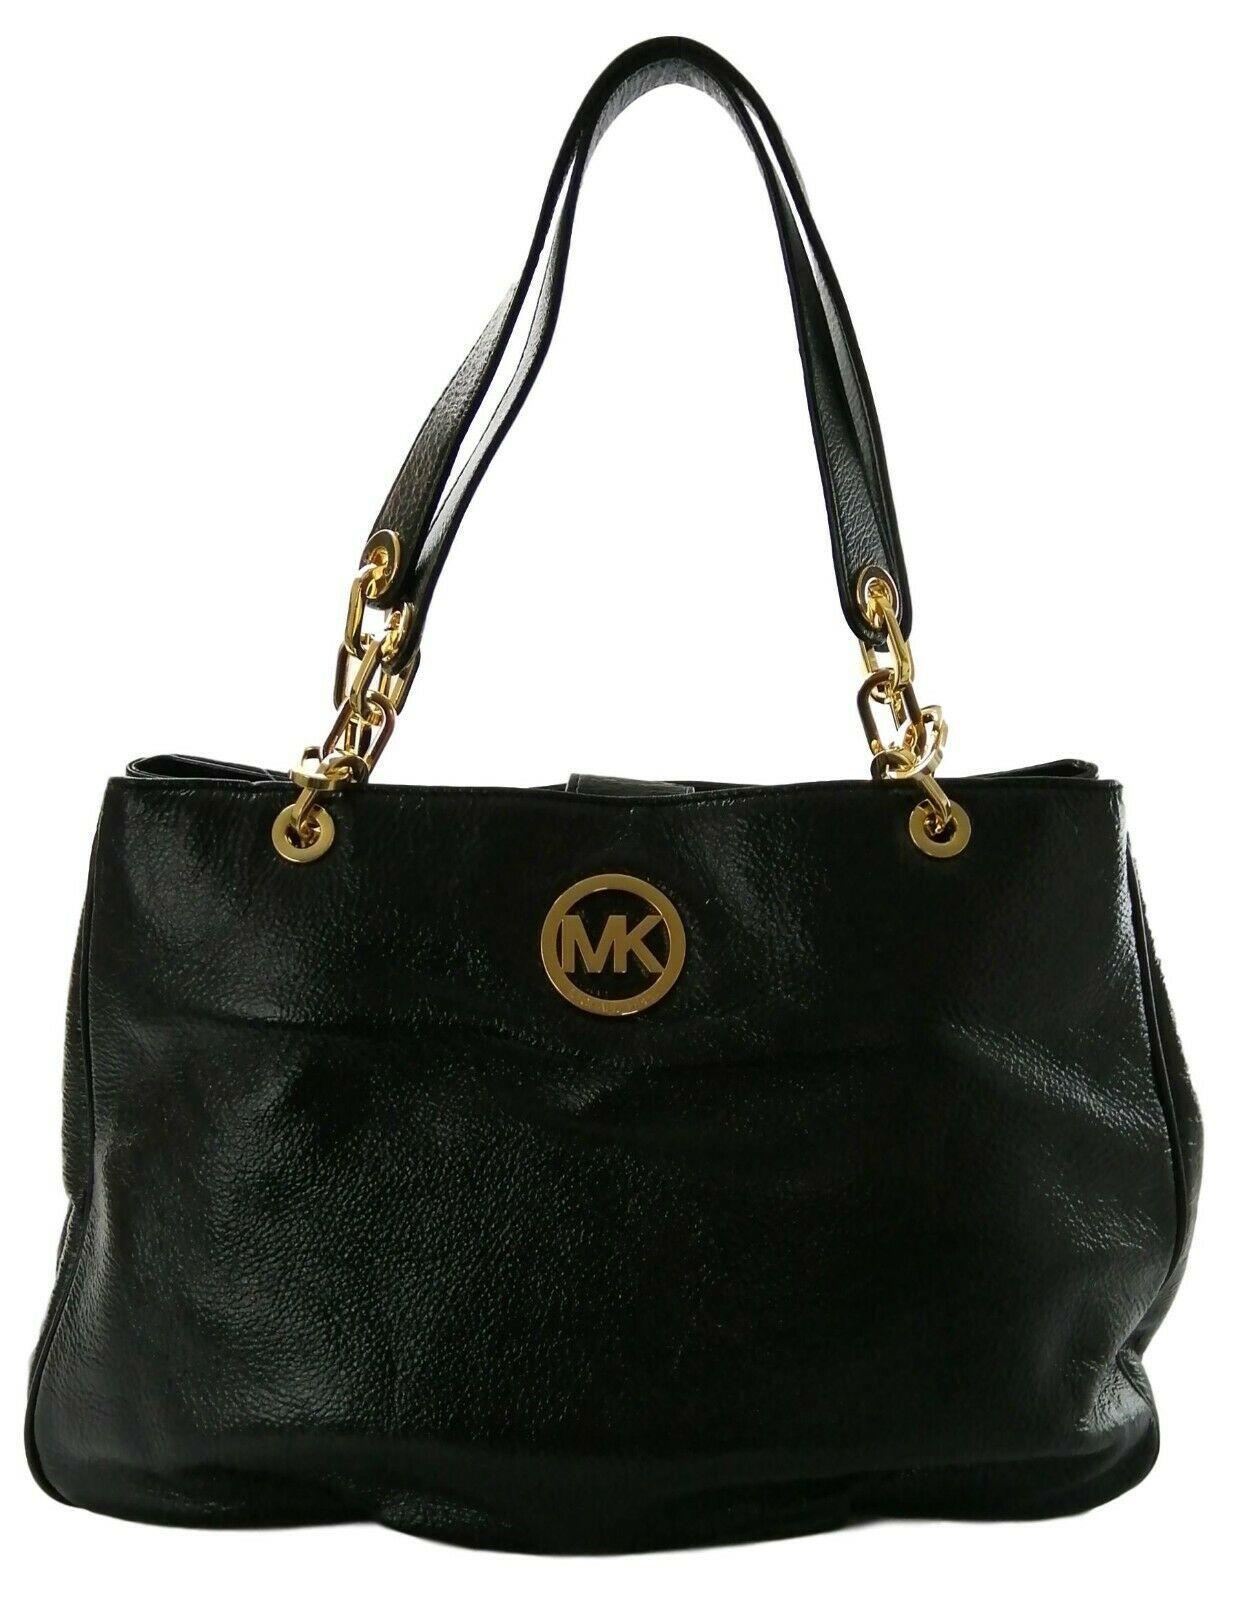 Michael Kors City Shoulder Bag: 6 customer reviews and 216